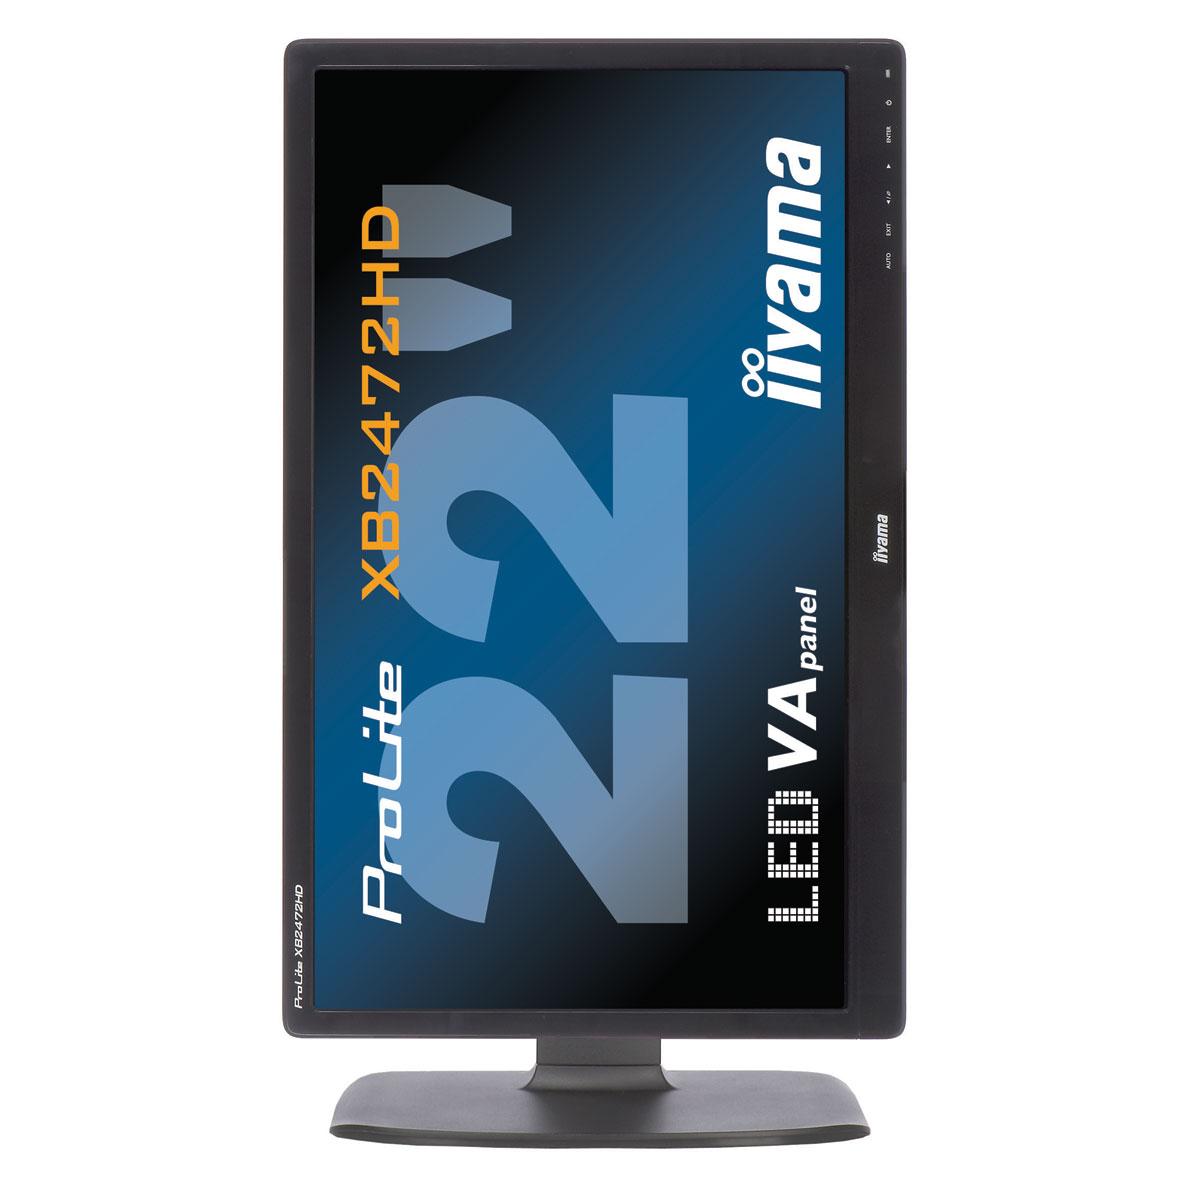 Iiyama 24 led prolite xb2472hd plxb2472hd b1 achat for Vente ecran pc